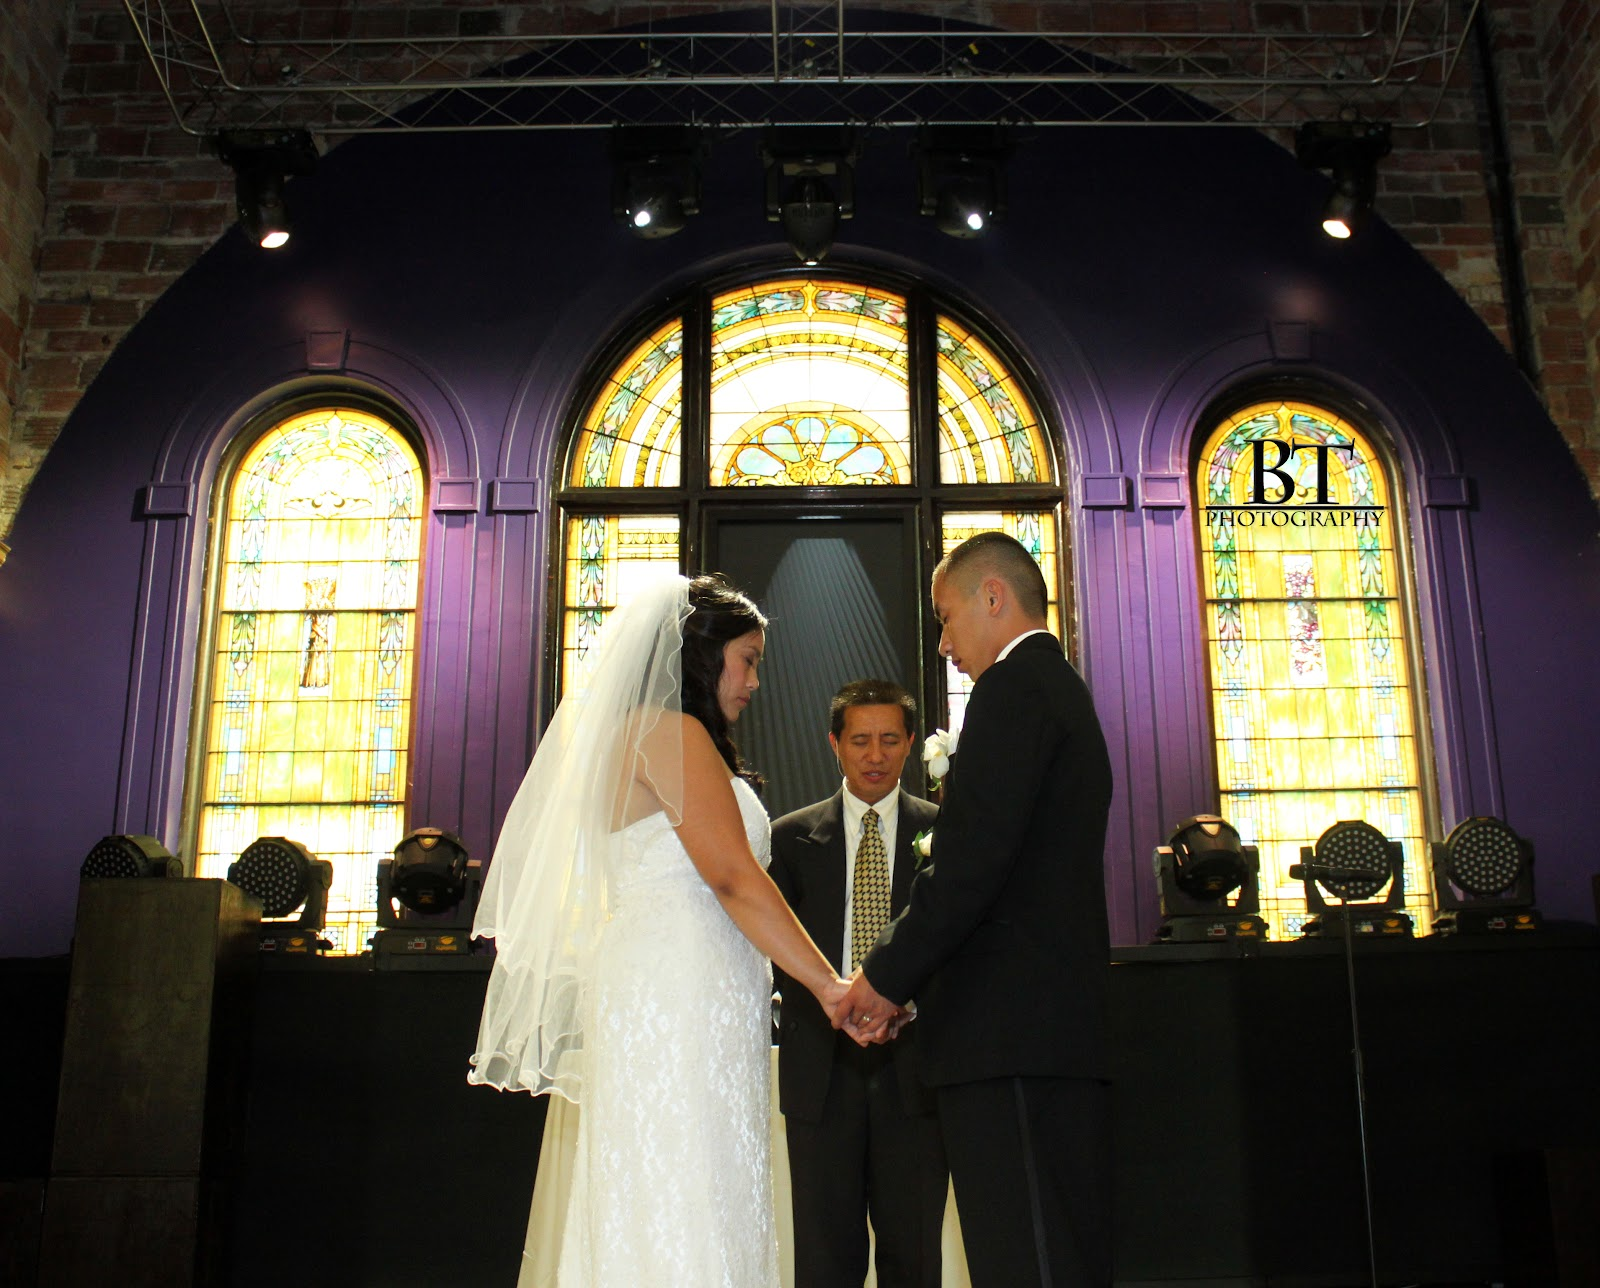 Vang wedding